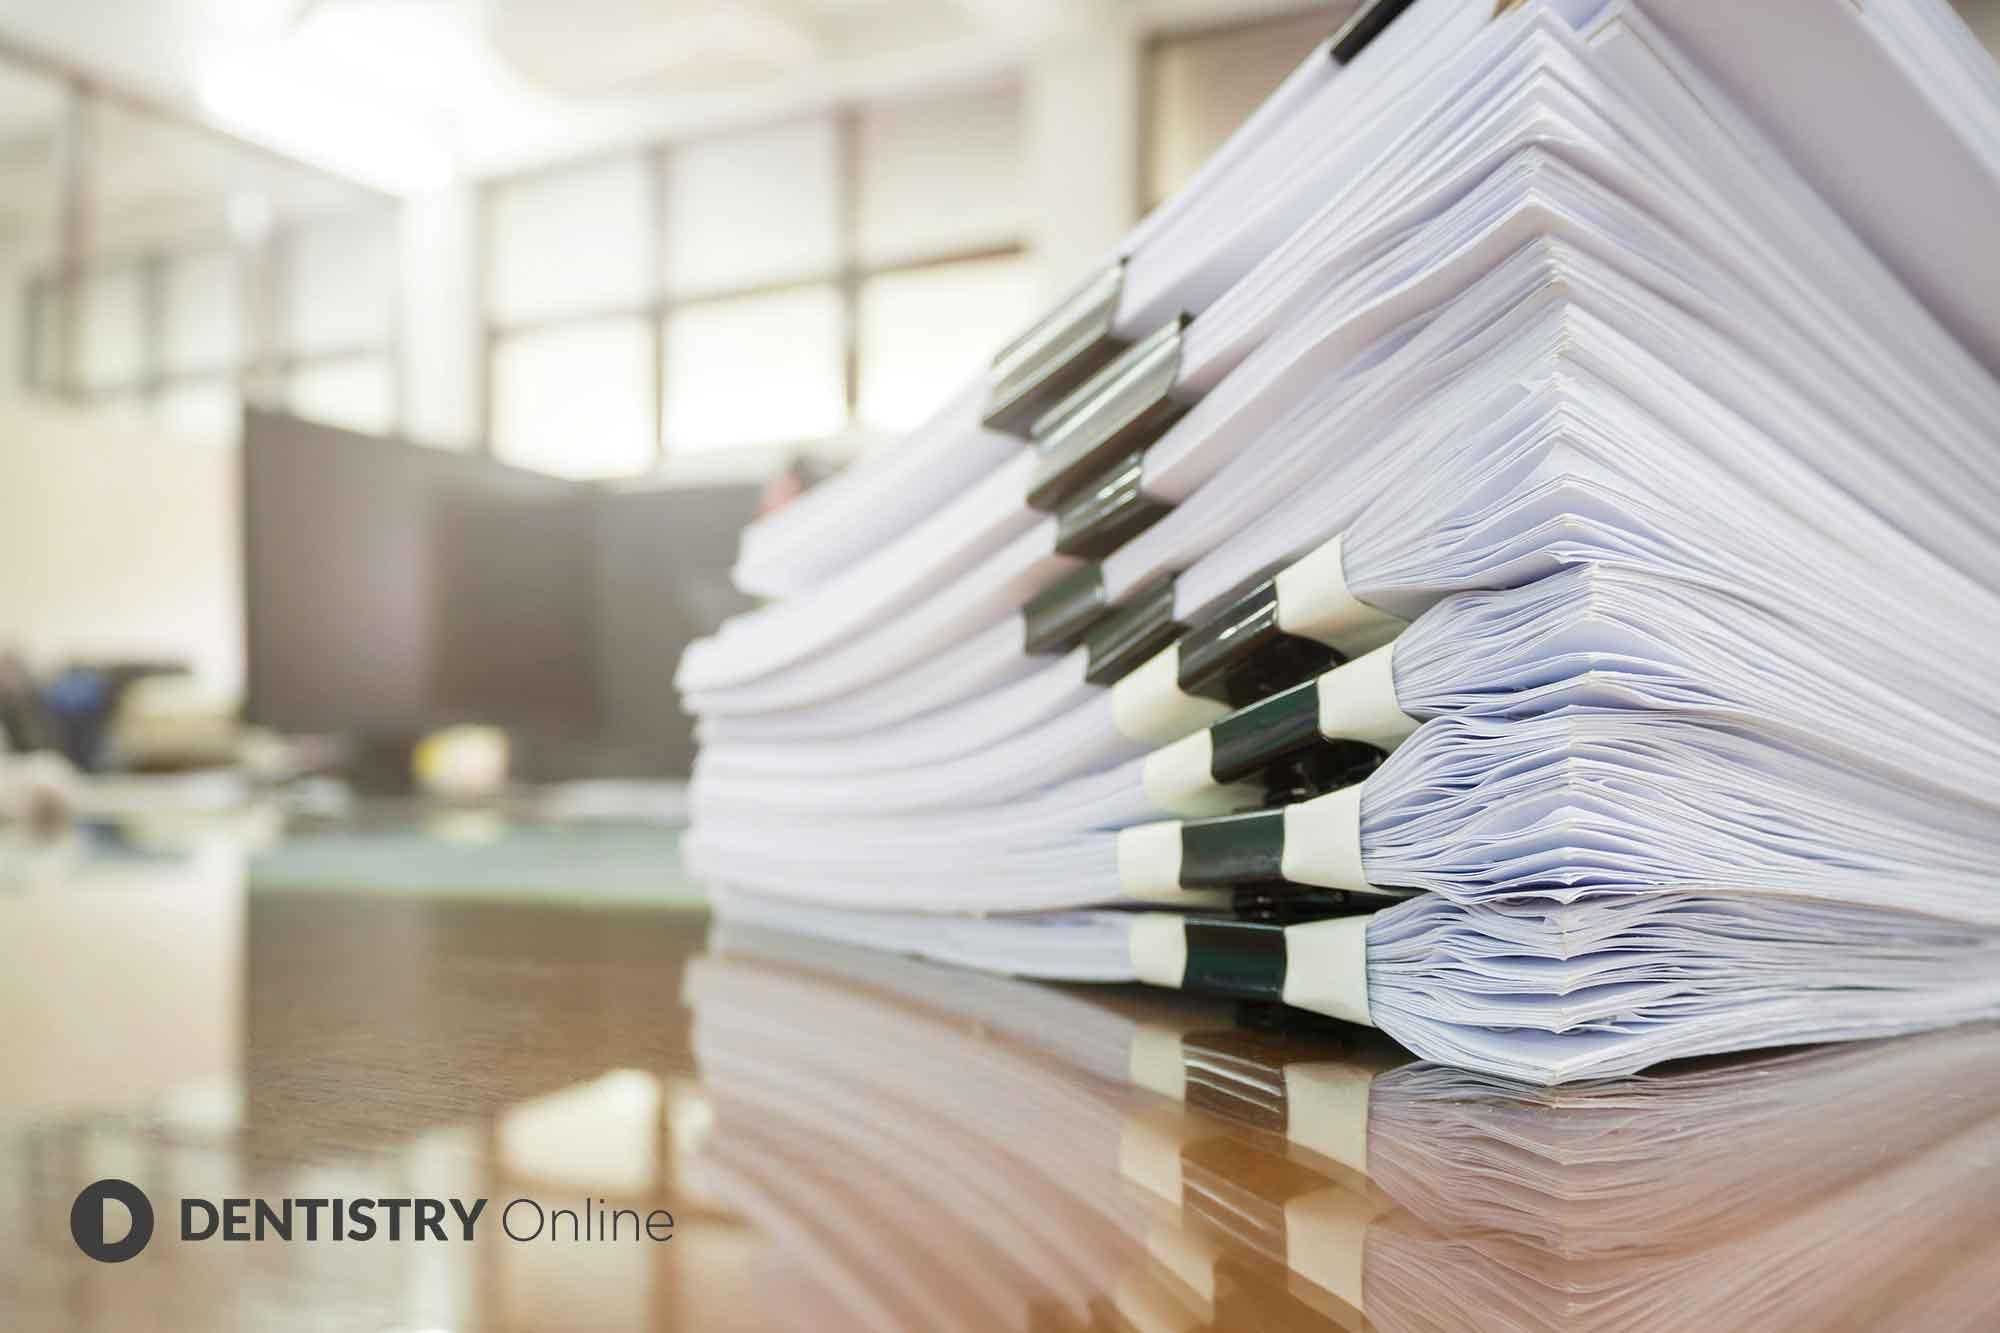 CQC delays in registration process